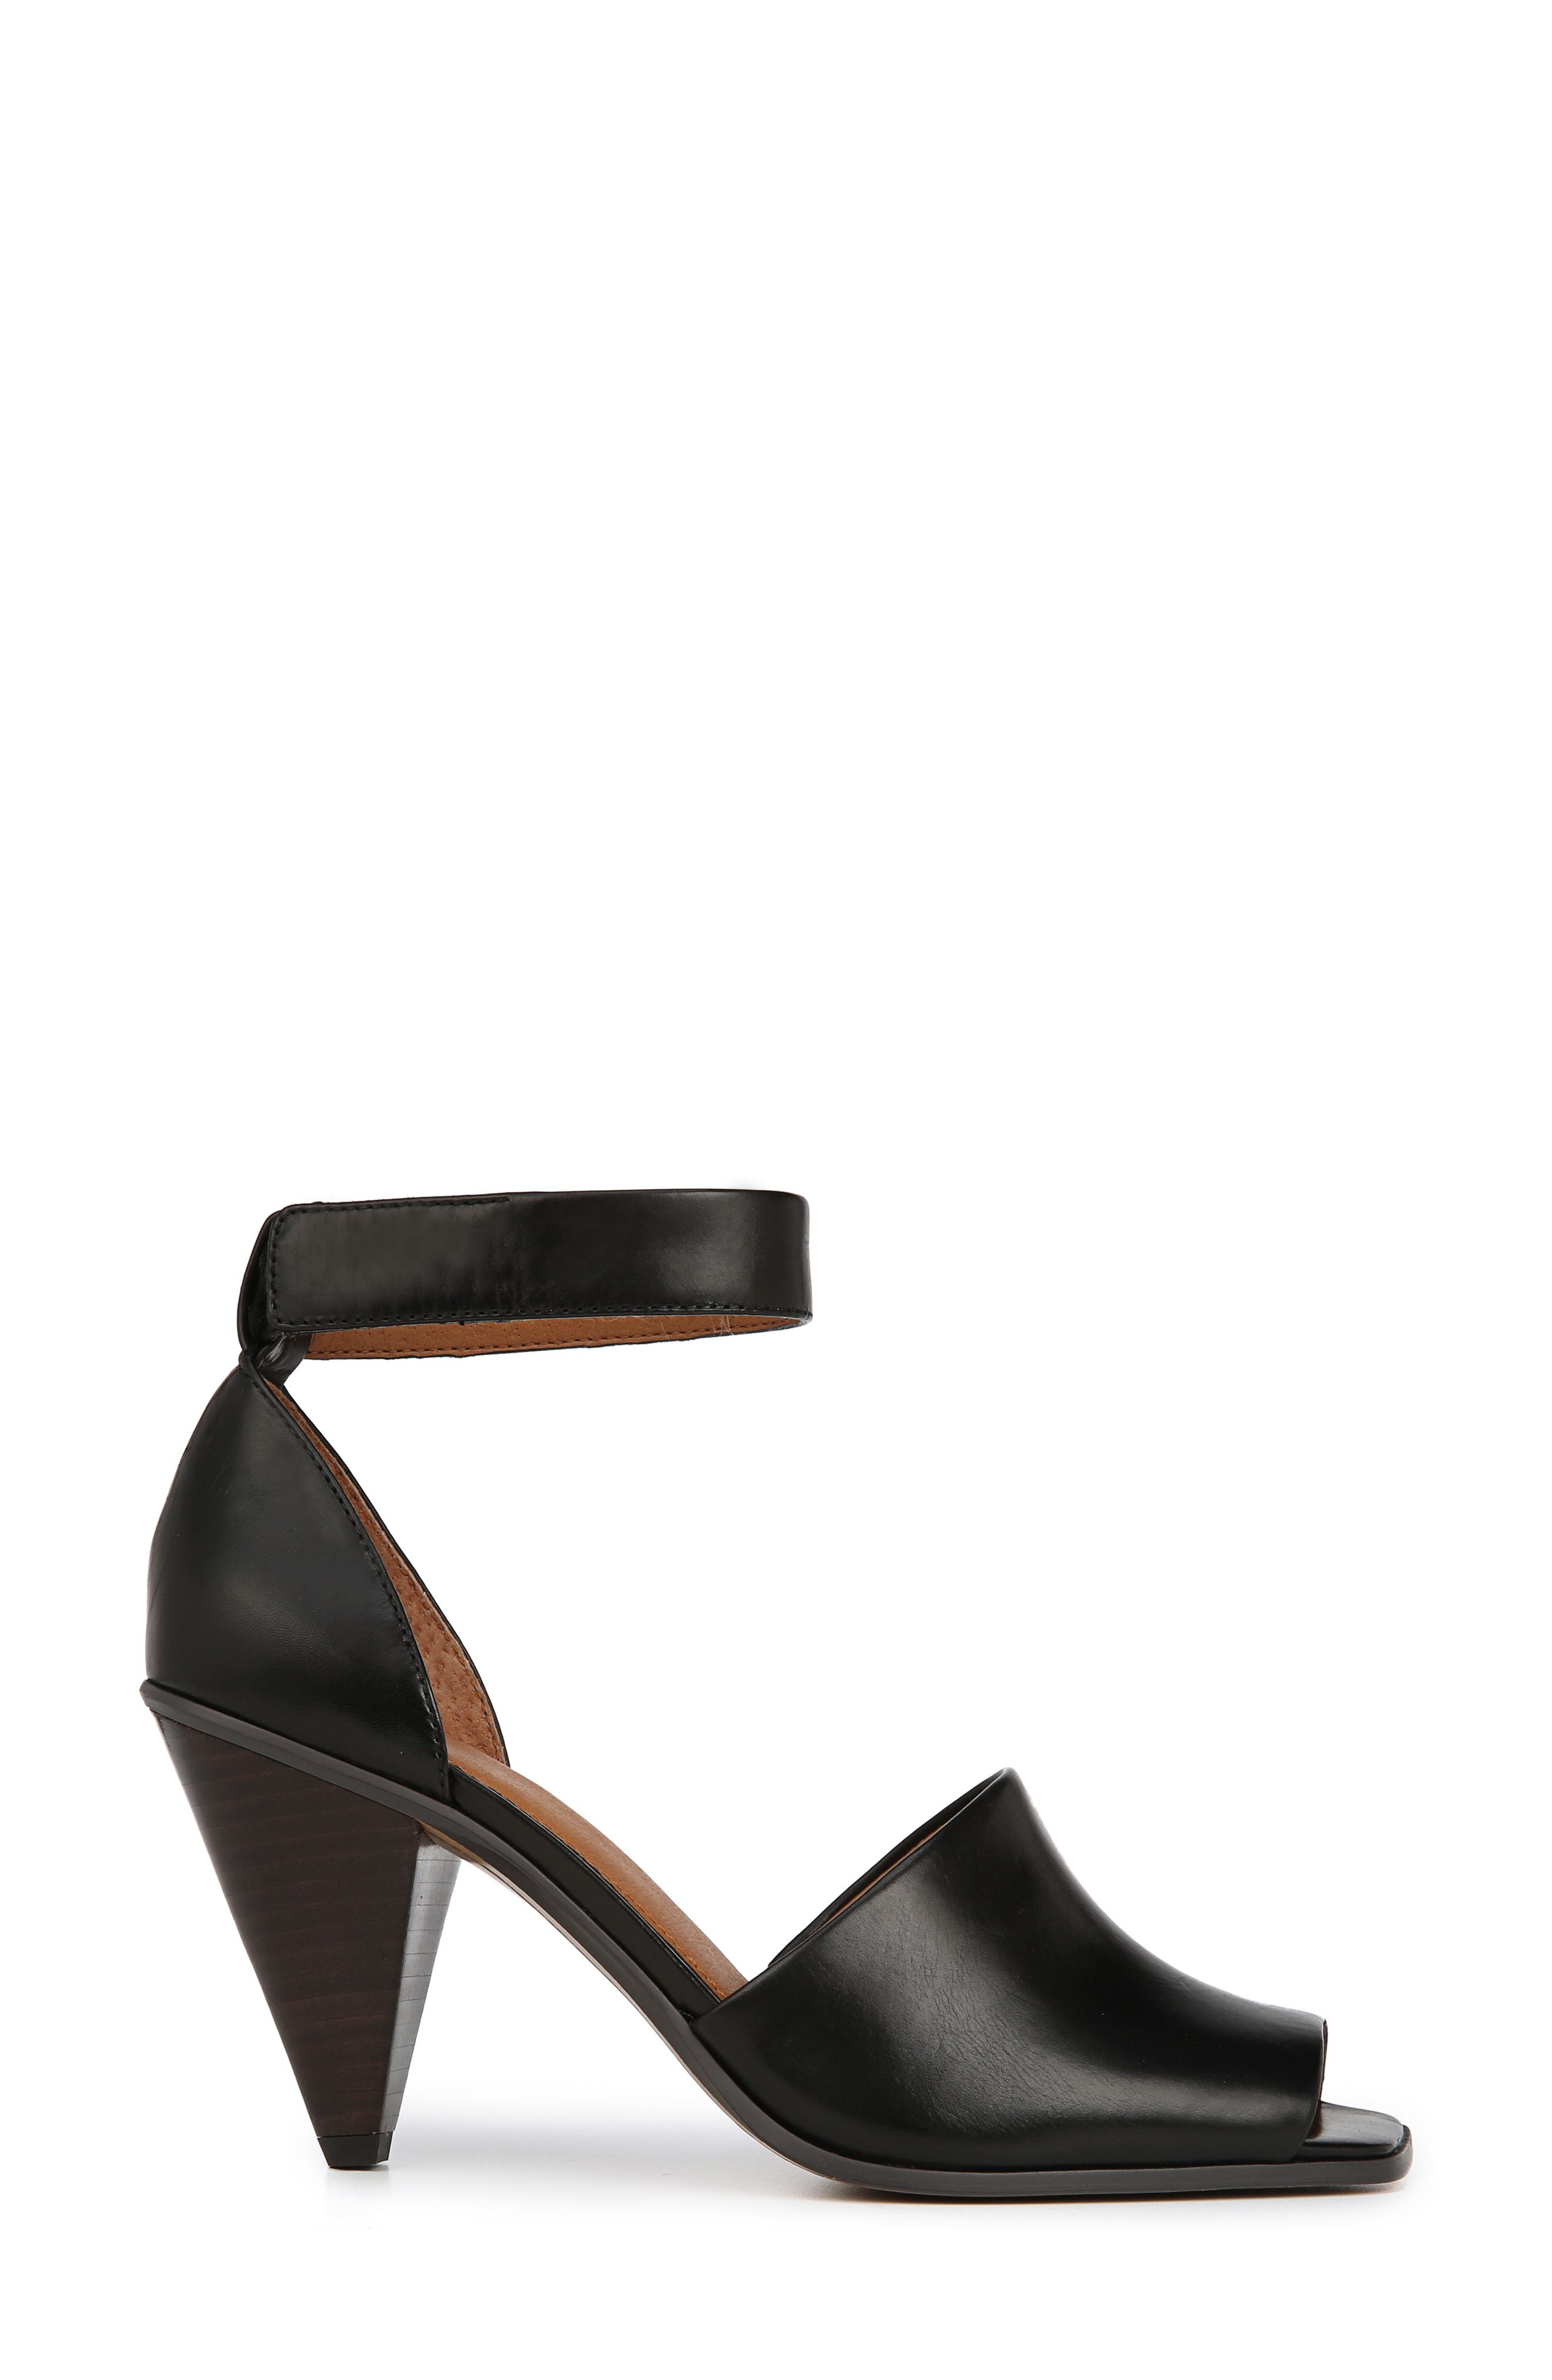 Ankle Strap Sandal,                             Alternate thumbnail 3, color,                             BLACK FOULARD LEATHER